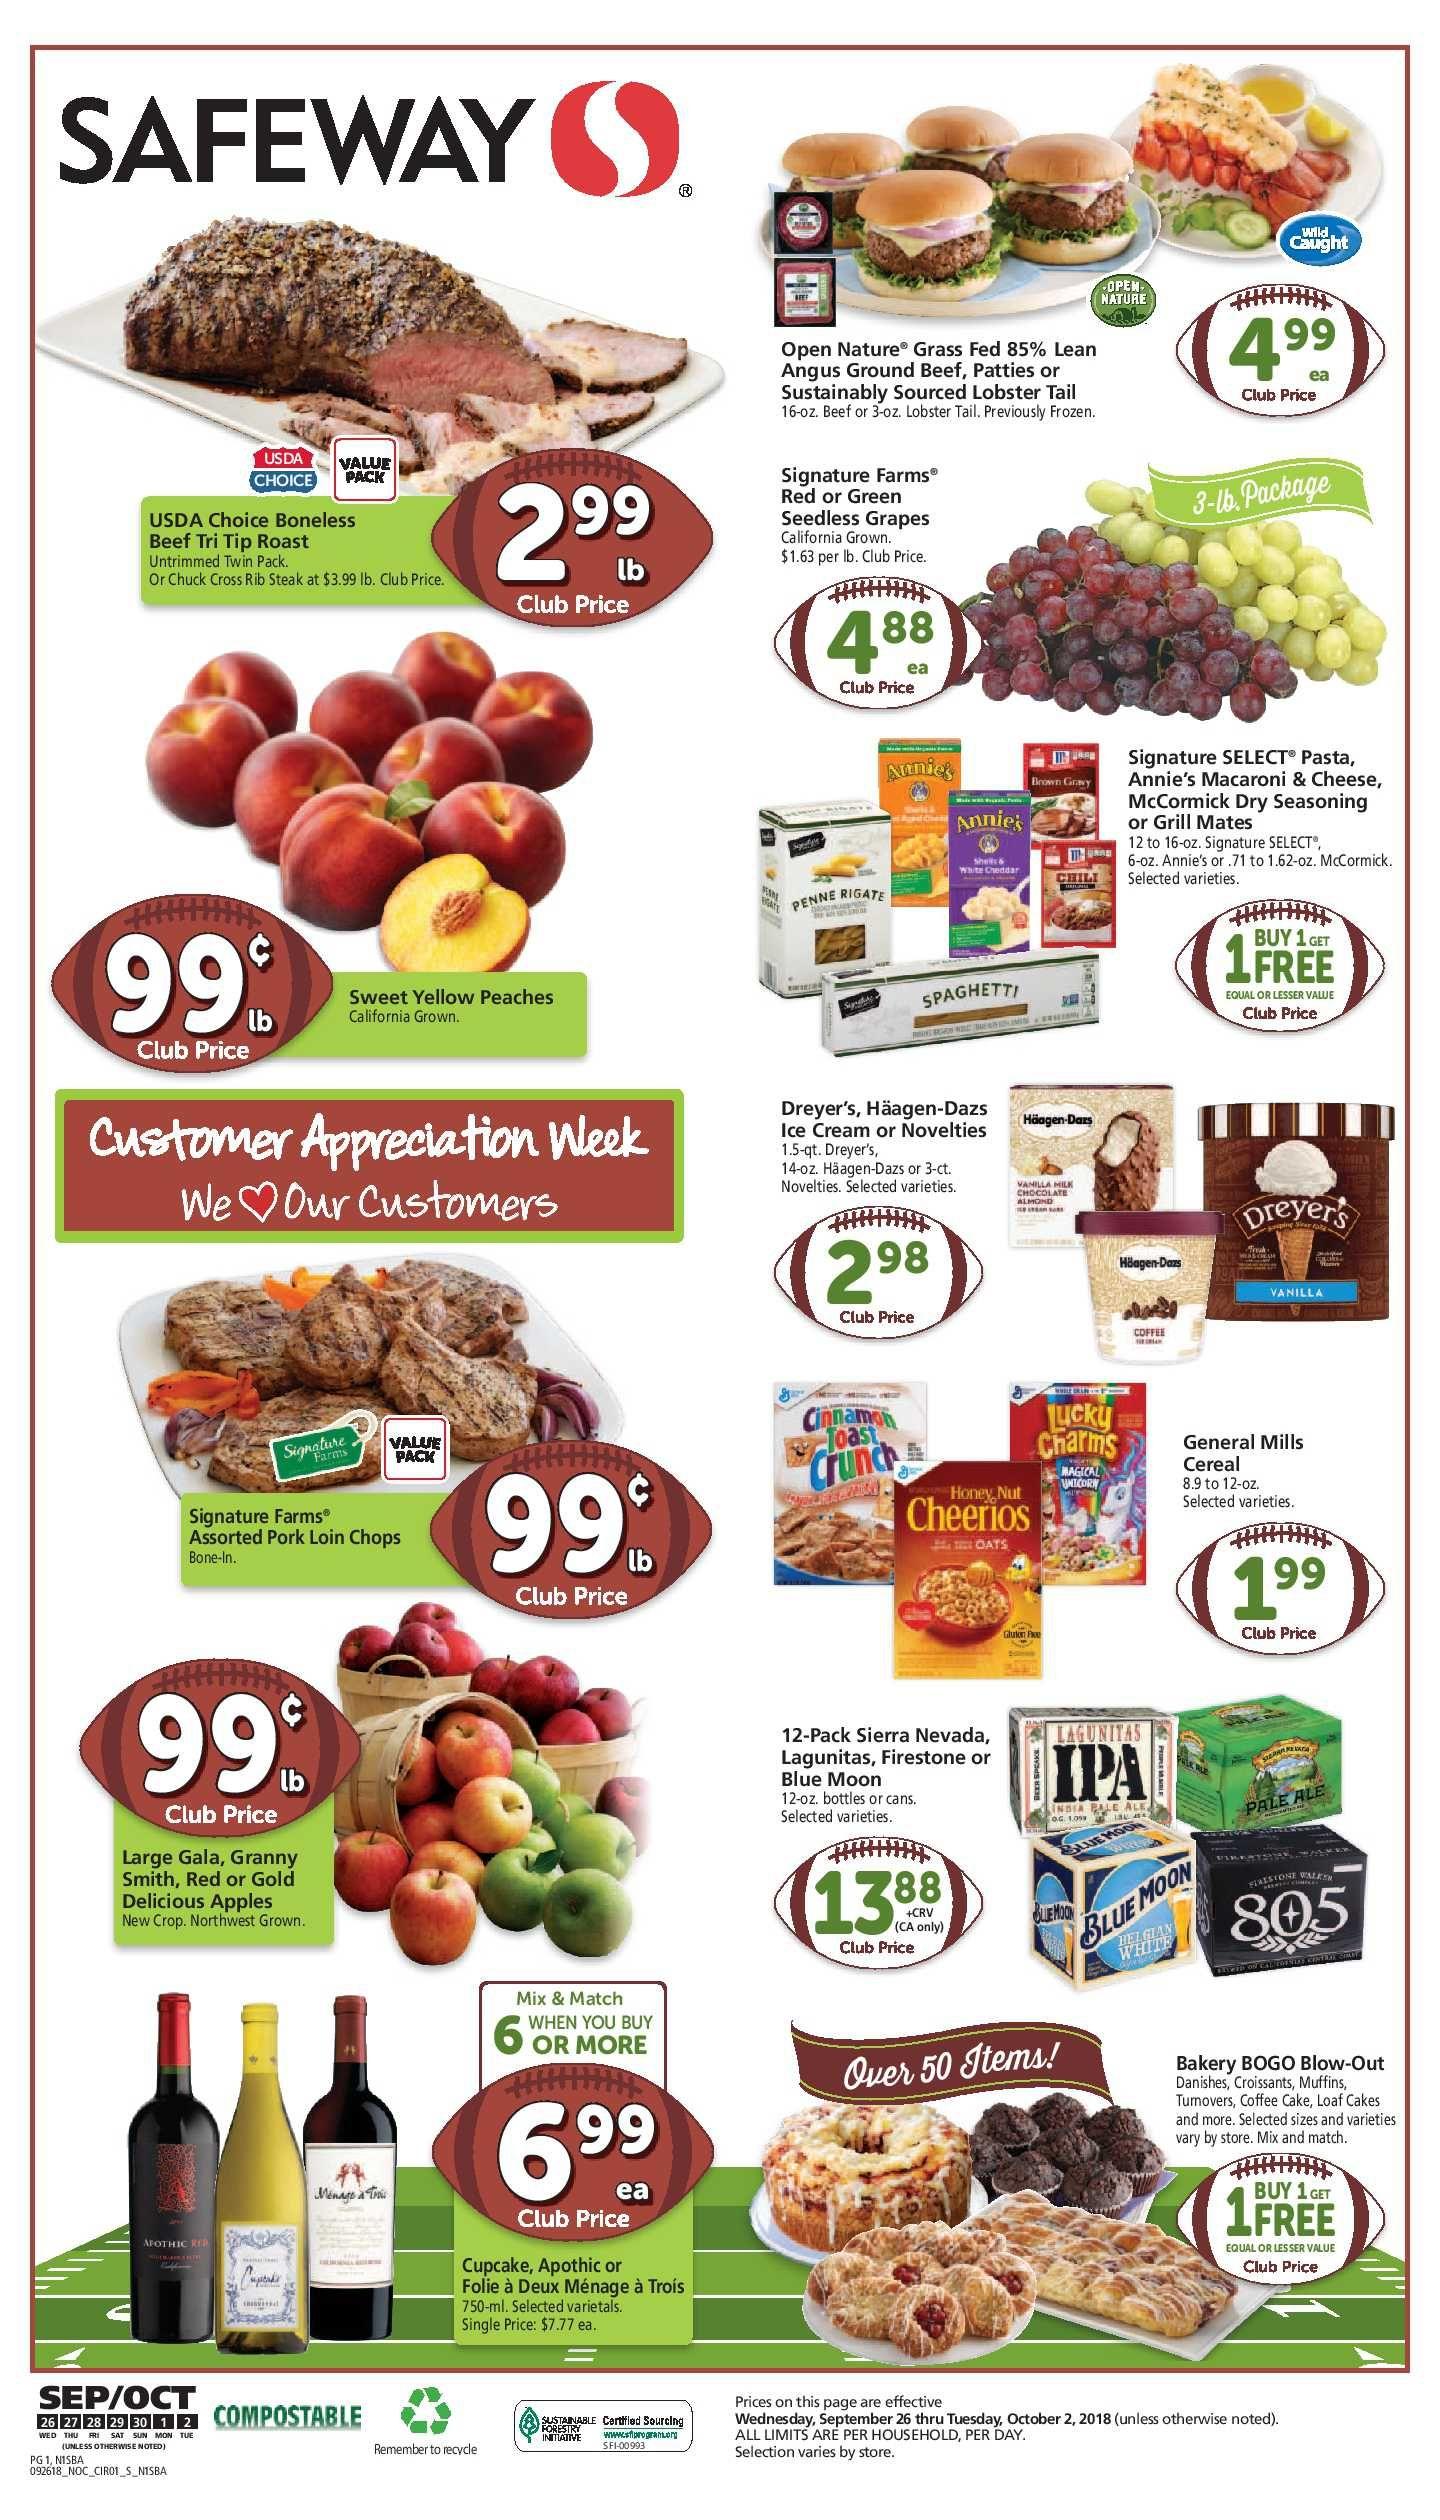 Safeway Weekly Ad Flyer 5 26 21 6 1 21 Weeklyad123 Com Weekly Ad Circular Grocery Stores Weekly Ads Safeway Grocery Savings